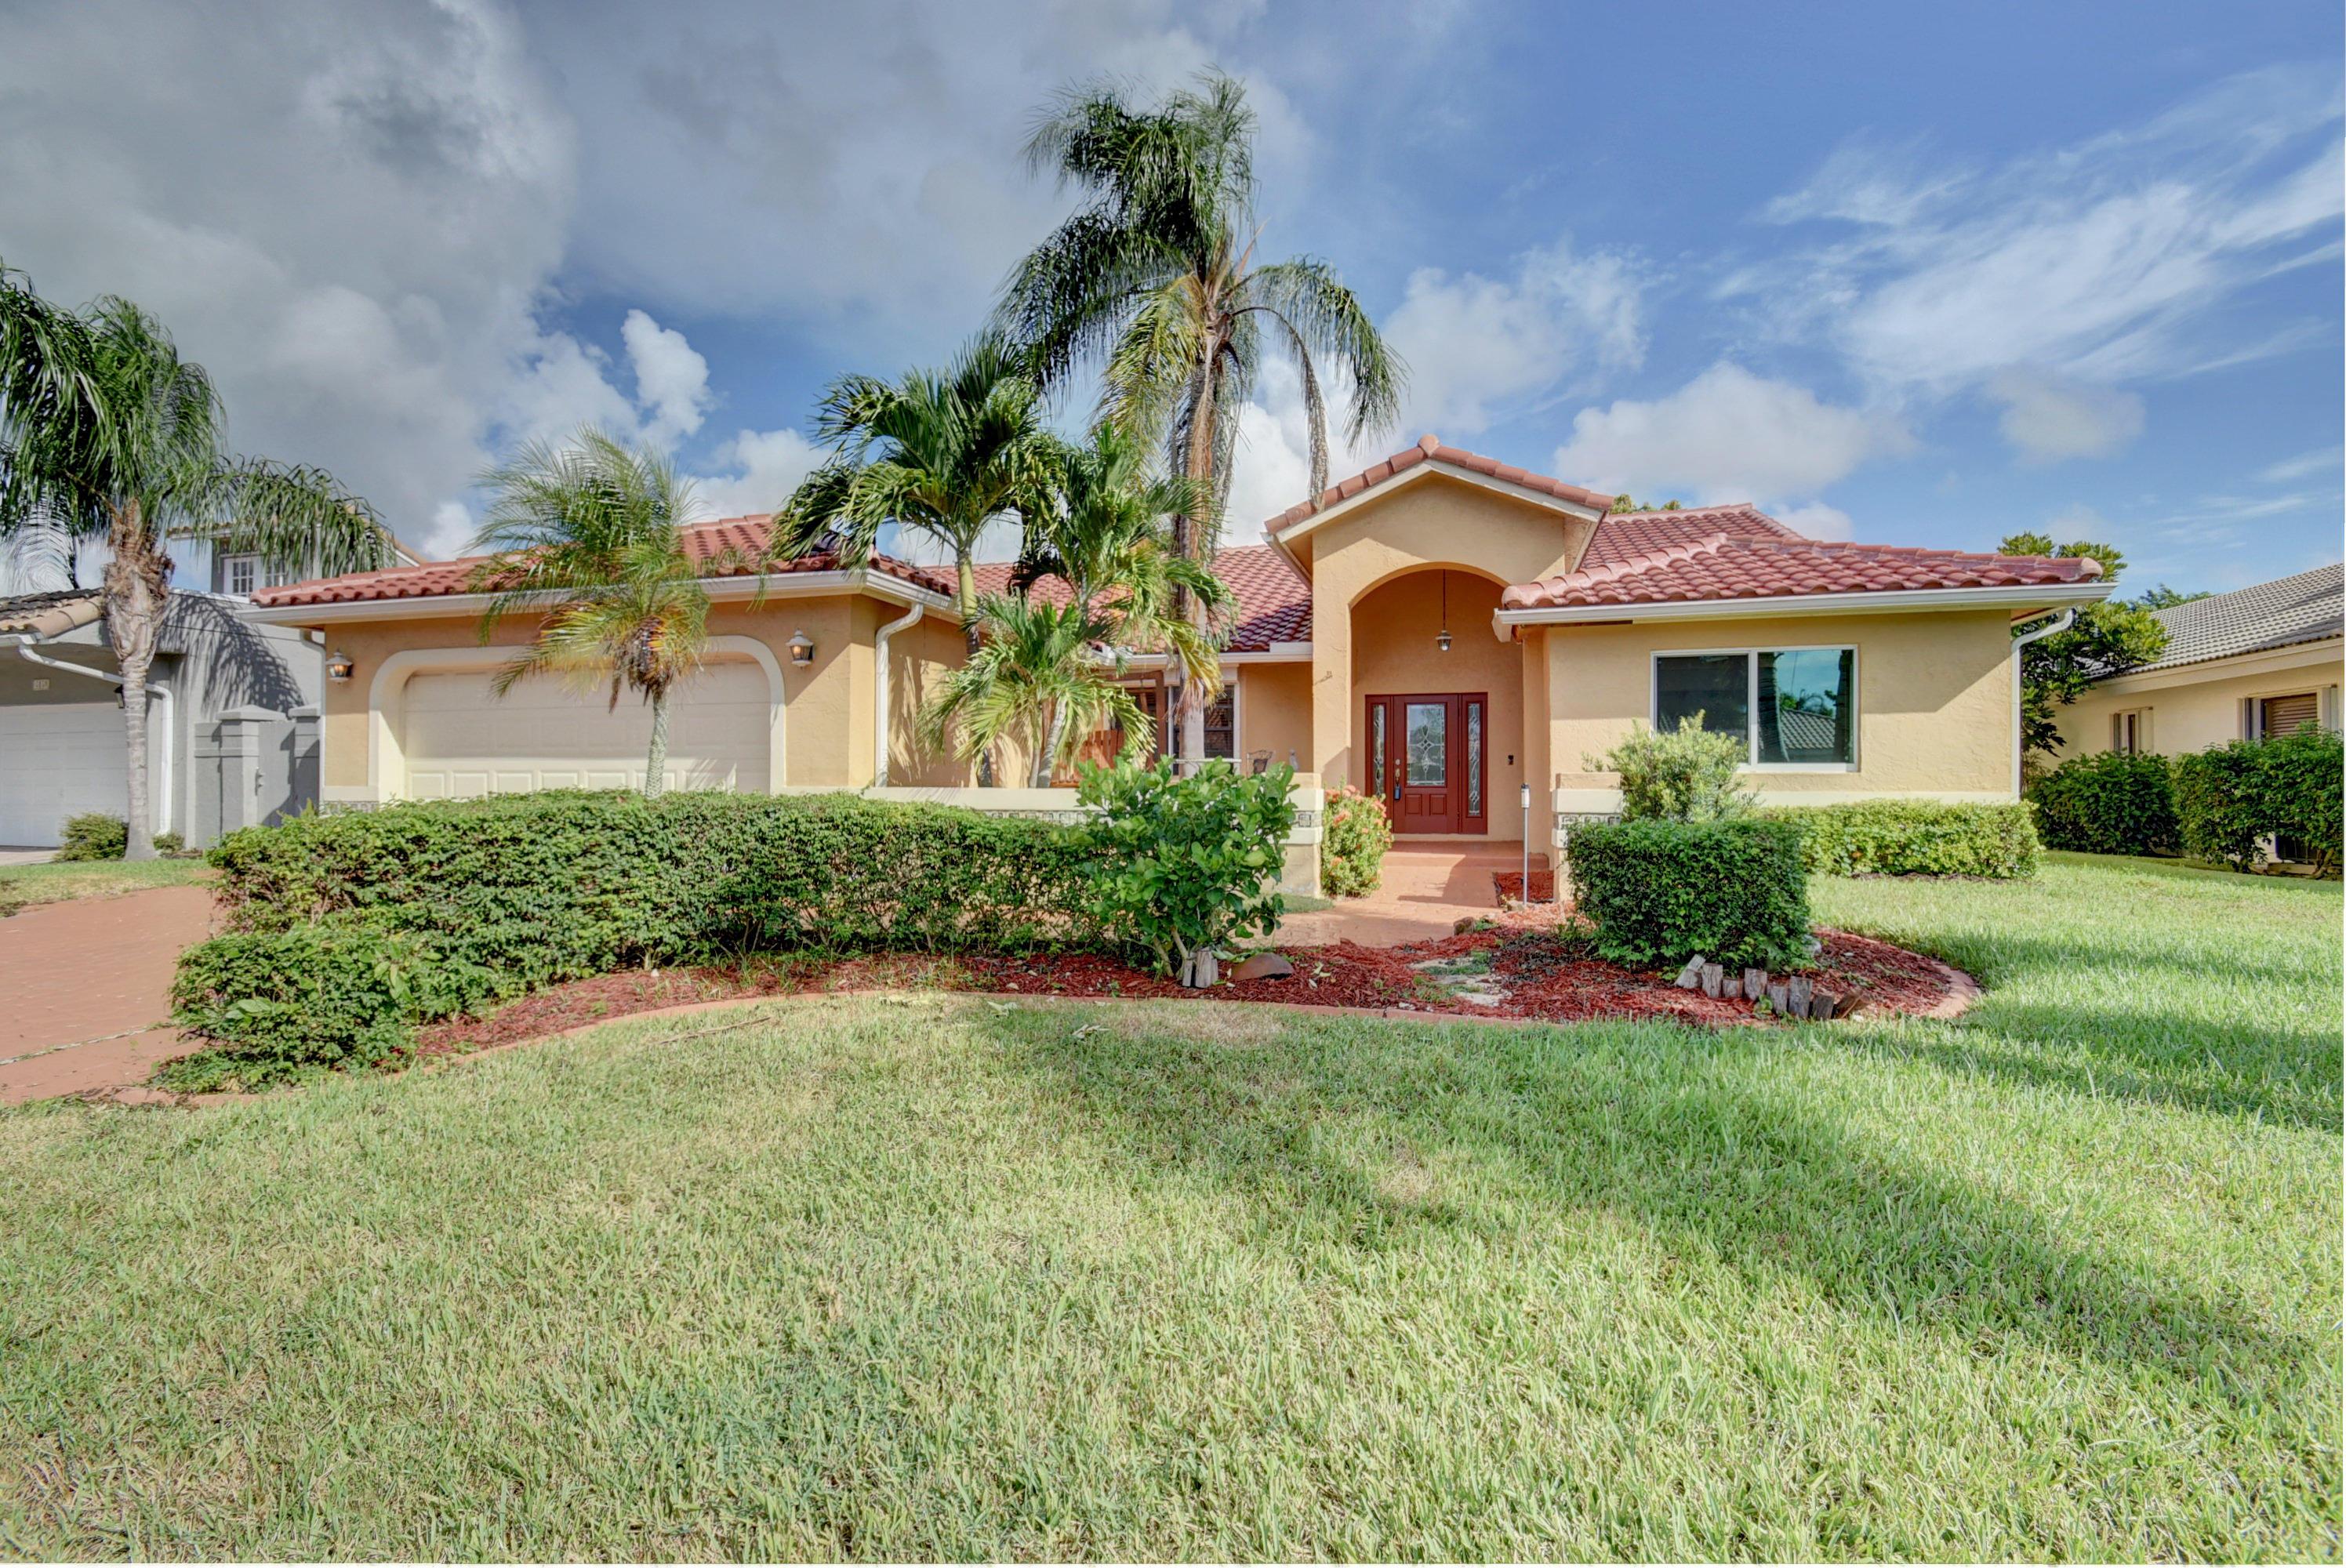 5155 Deerhurst Crescent Circle Boca Raton, FL 33486